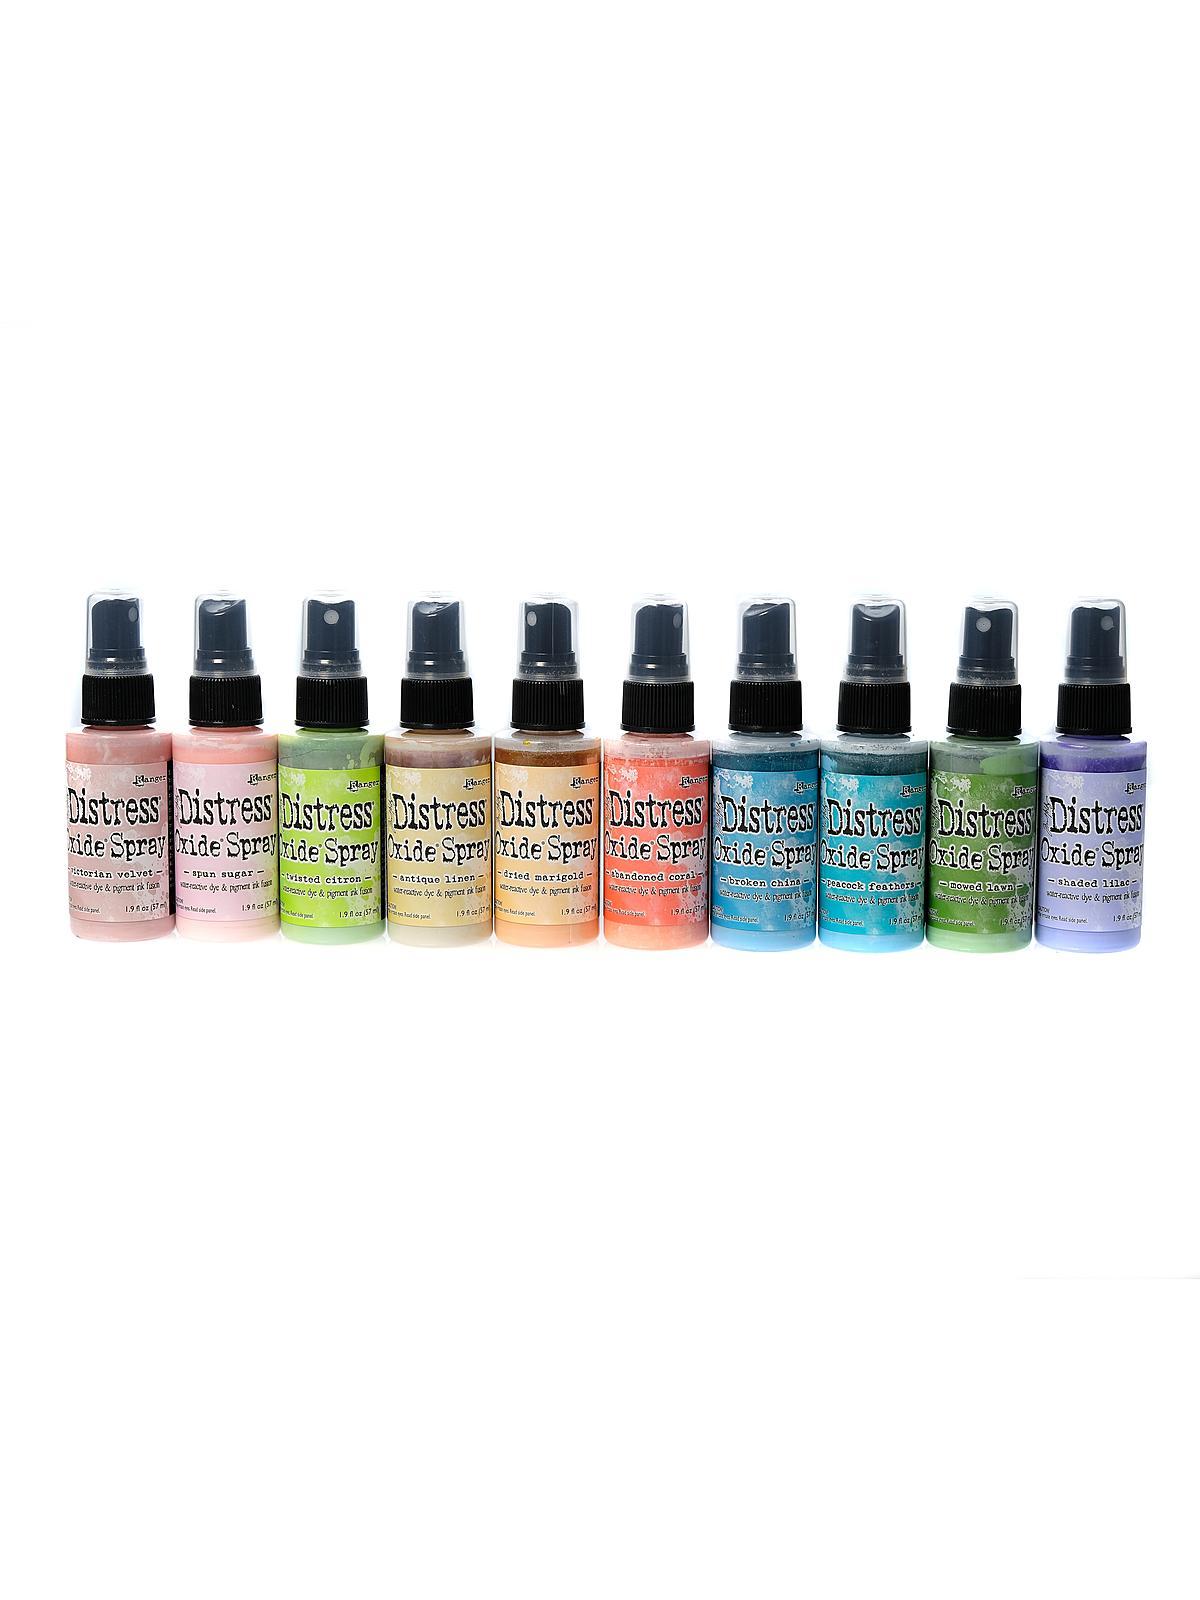 Tim Holtz Distress Oxide Sprays